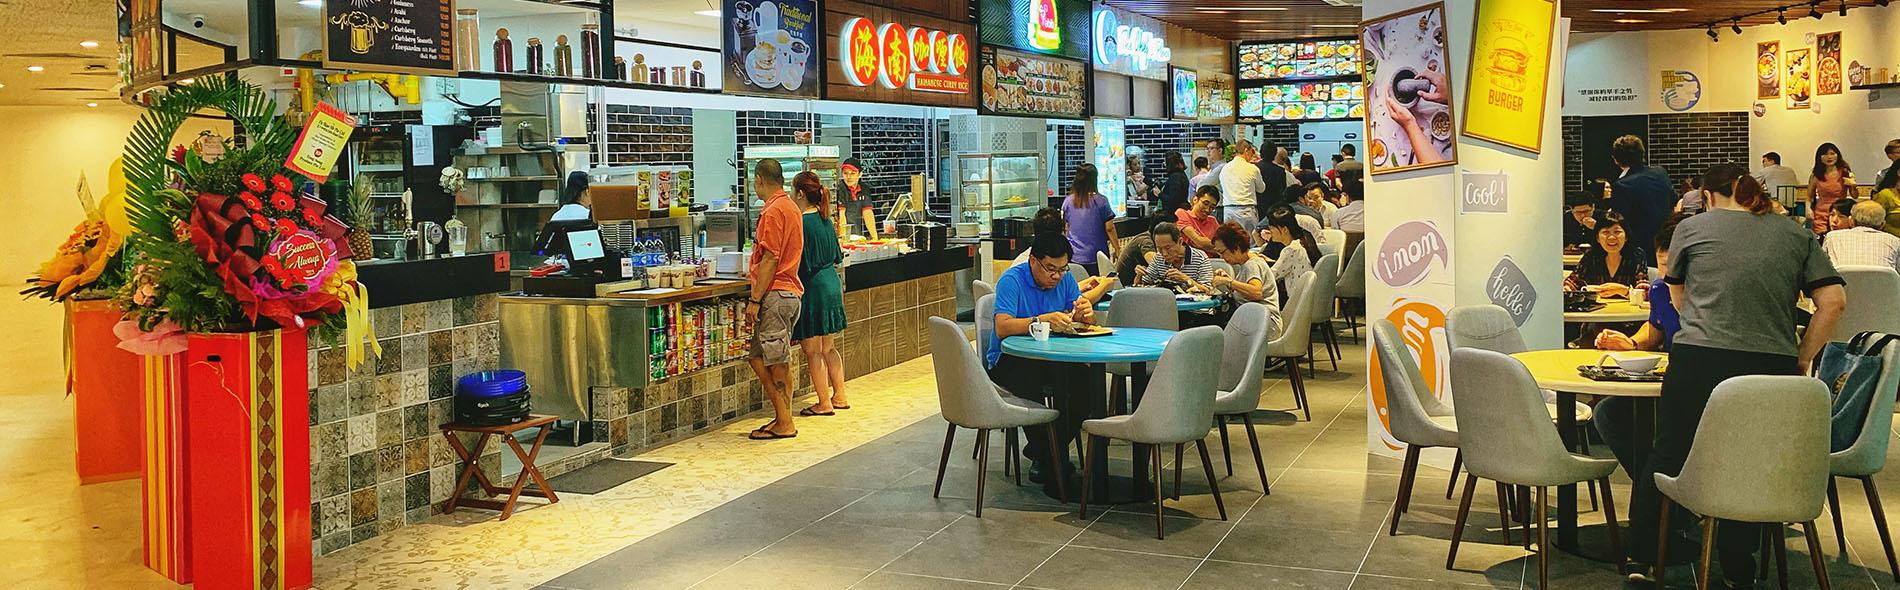 1900x590_MF Food Paradise